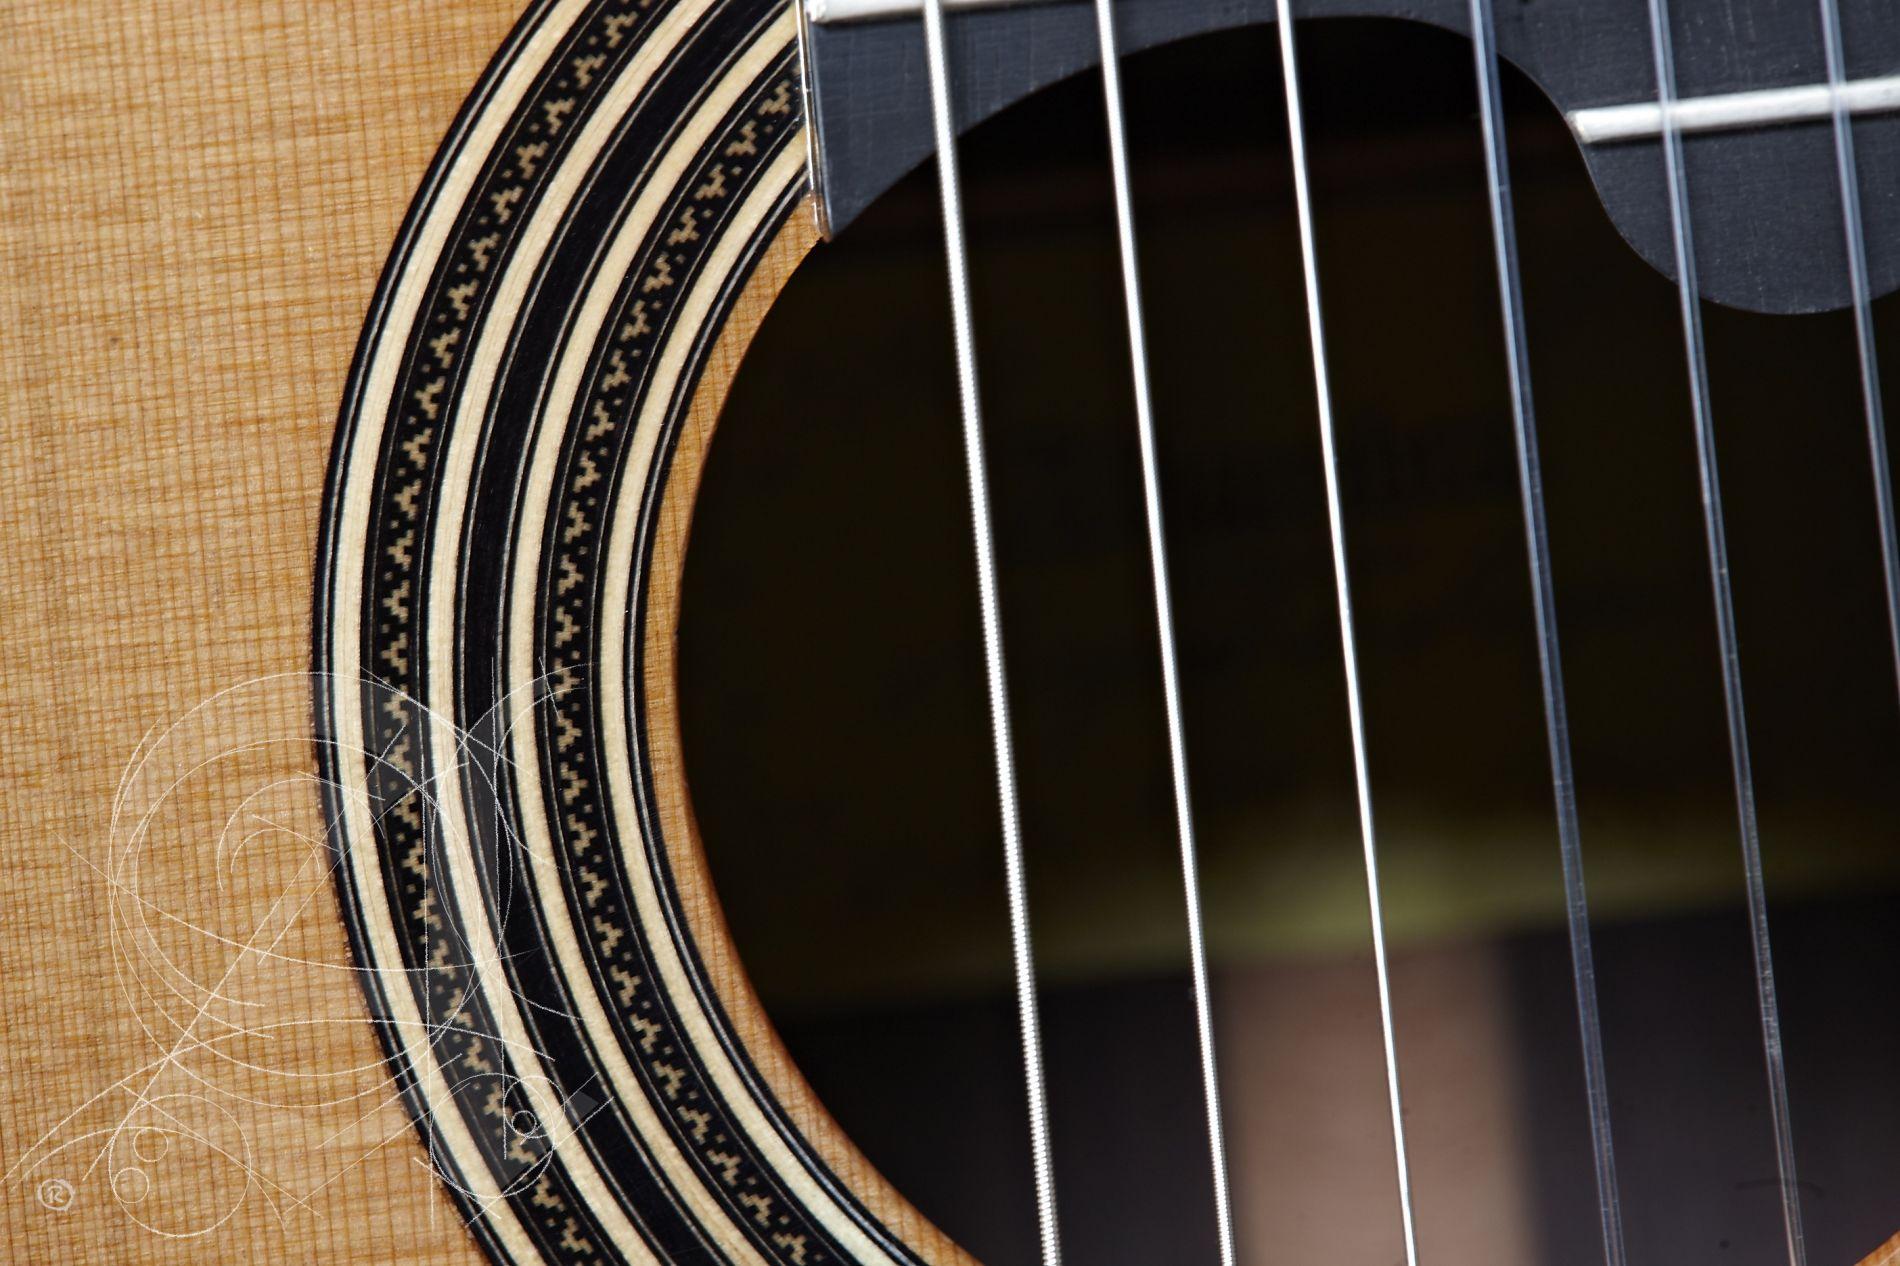 Alhambra Guitarras LINEA PROFESIONAL +CASE (9650)